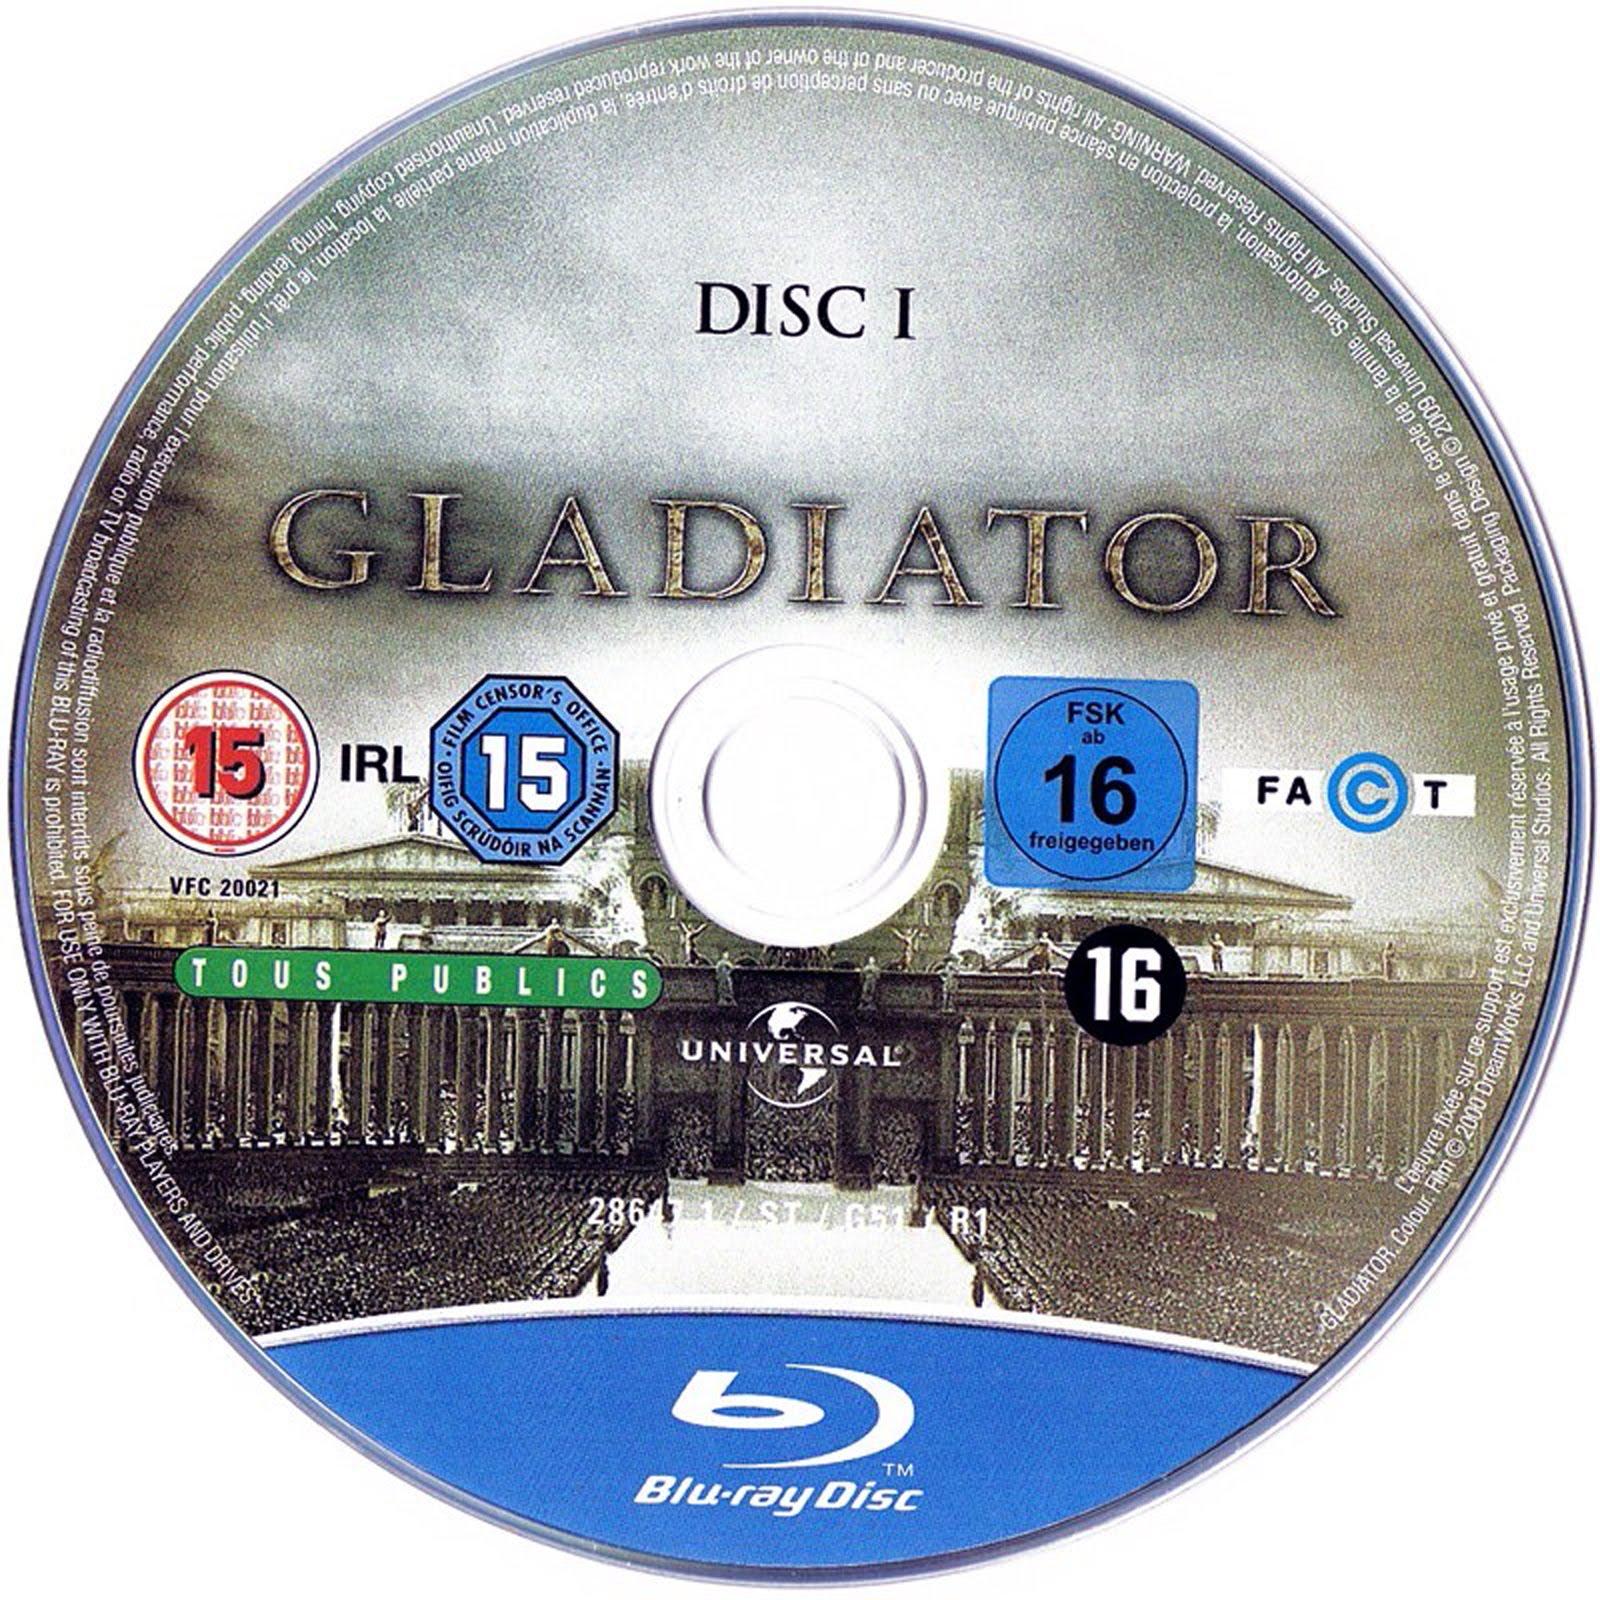 Gladiator Blu-ray Dvd Label Art